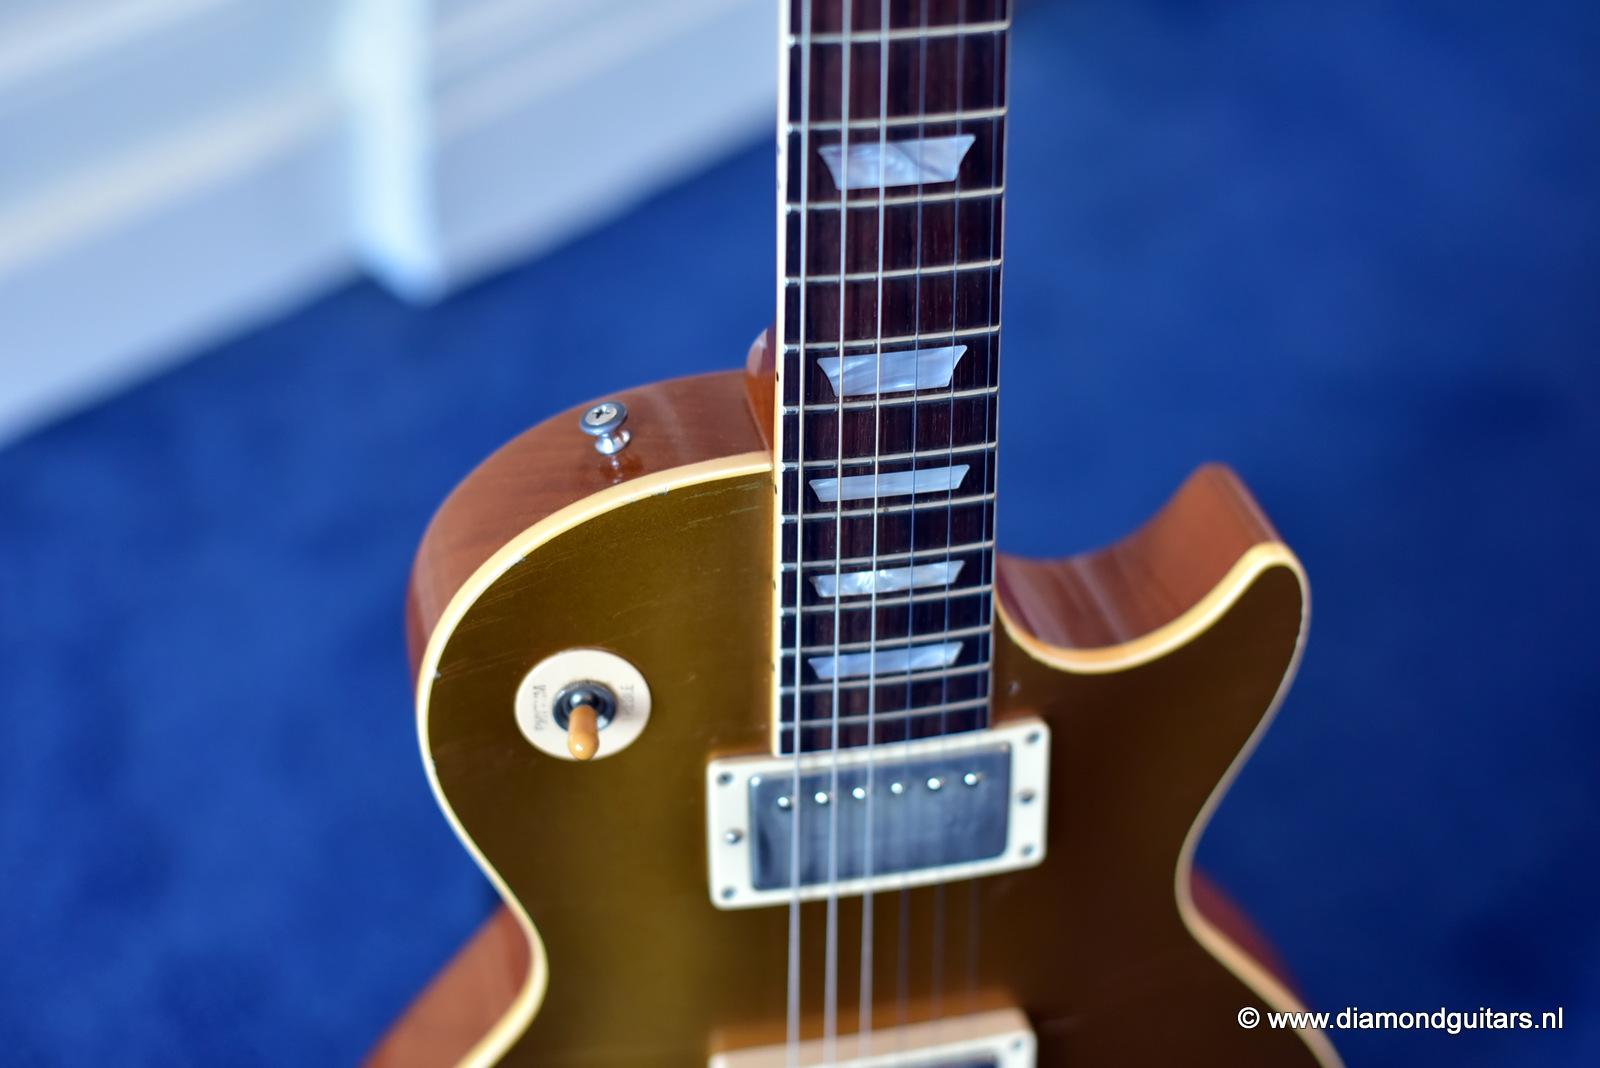 Gibson Les Paul 1957 Goldtop R7 Murphy Aged (SOLD) | Diamond